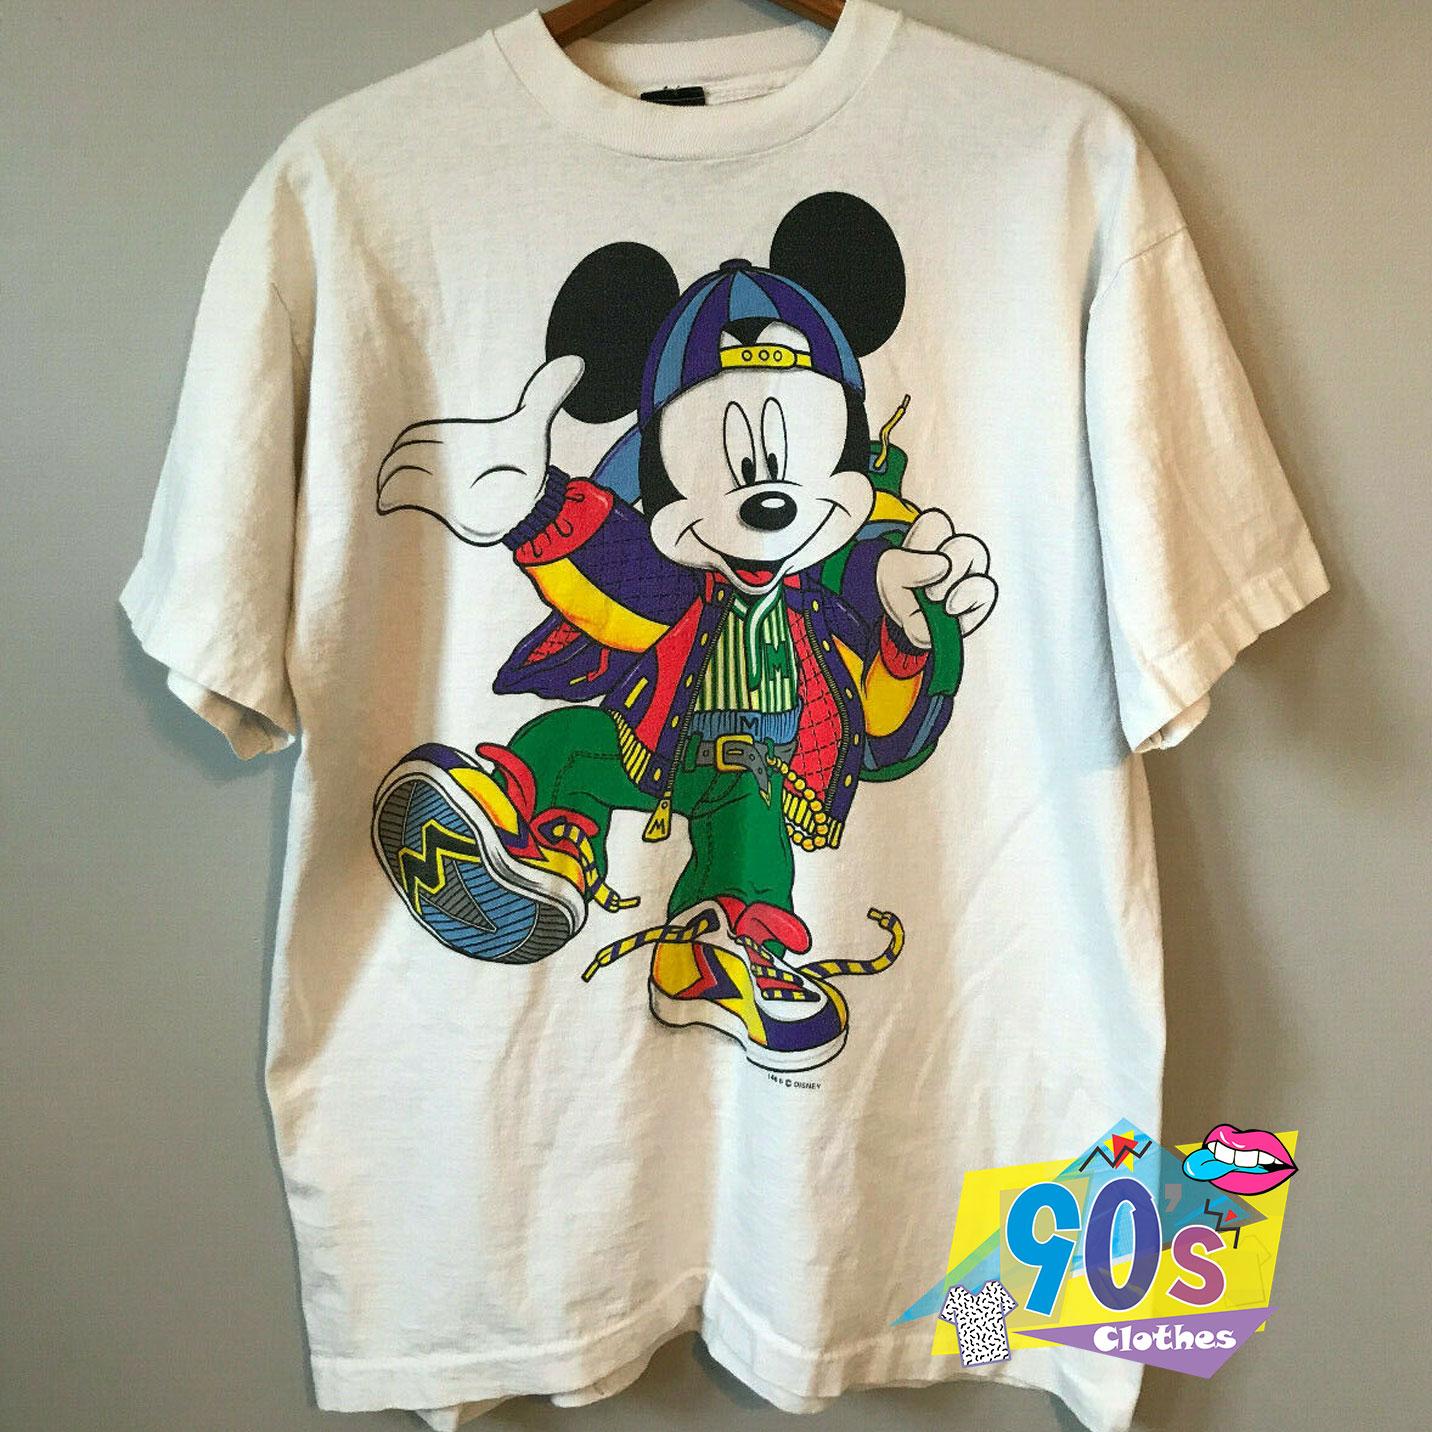 Vintage Mickey Mouse Hip Hop T Shirt On Sale - 90sclothes.com